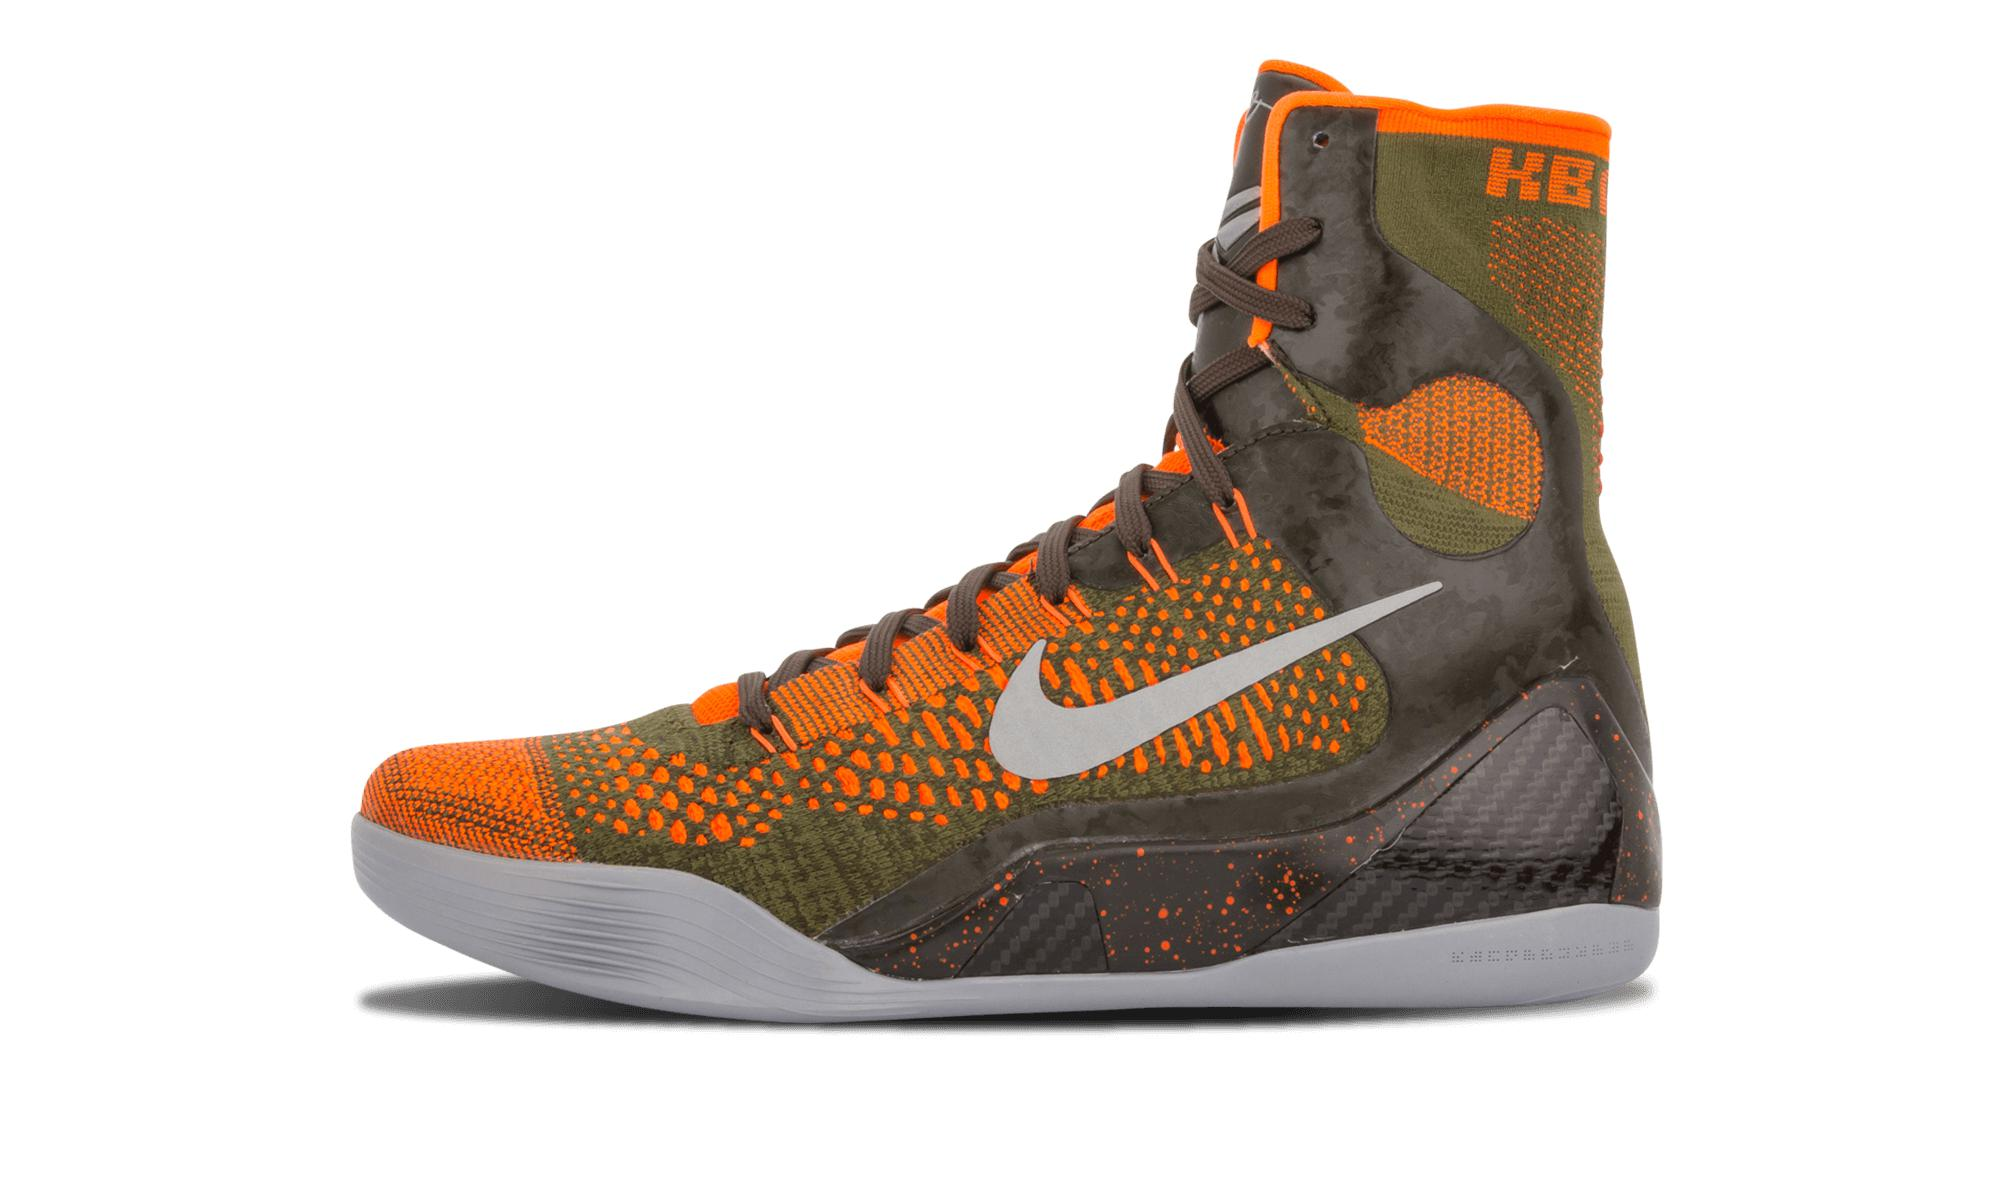 huge discount 58593 c3836 Lyst - Nike Kobe 9 Elite for Men